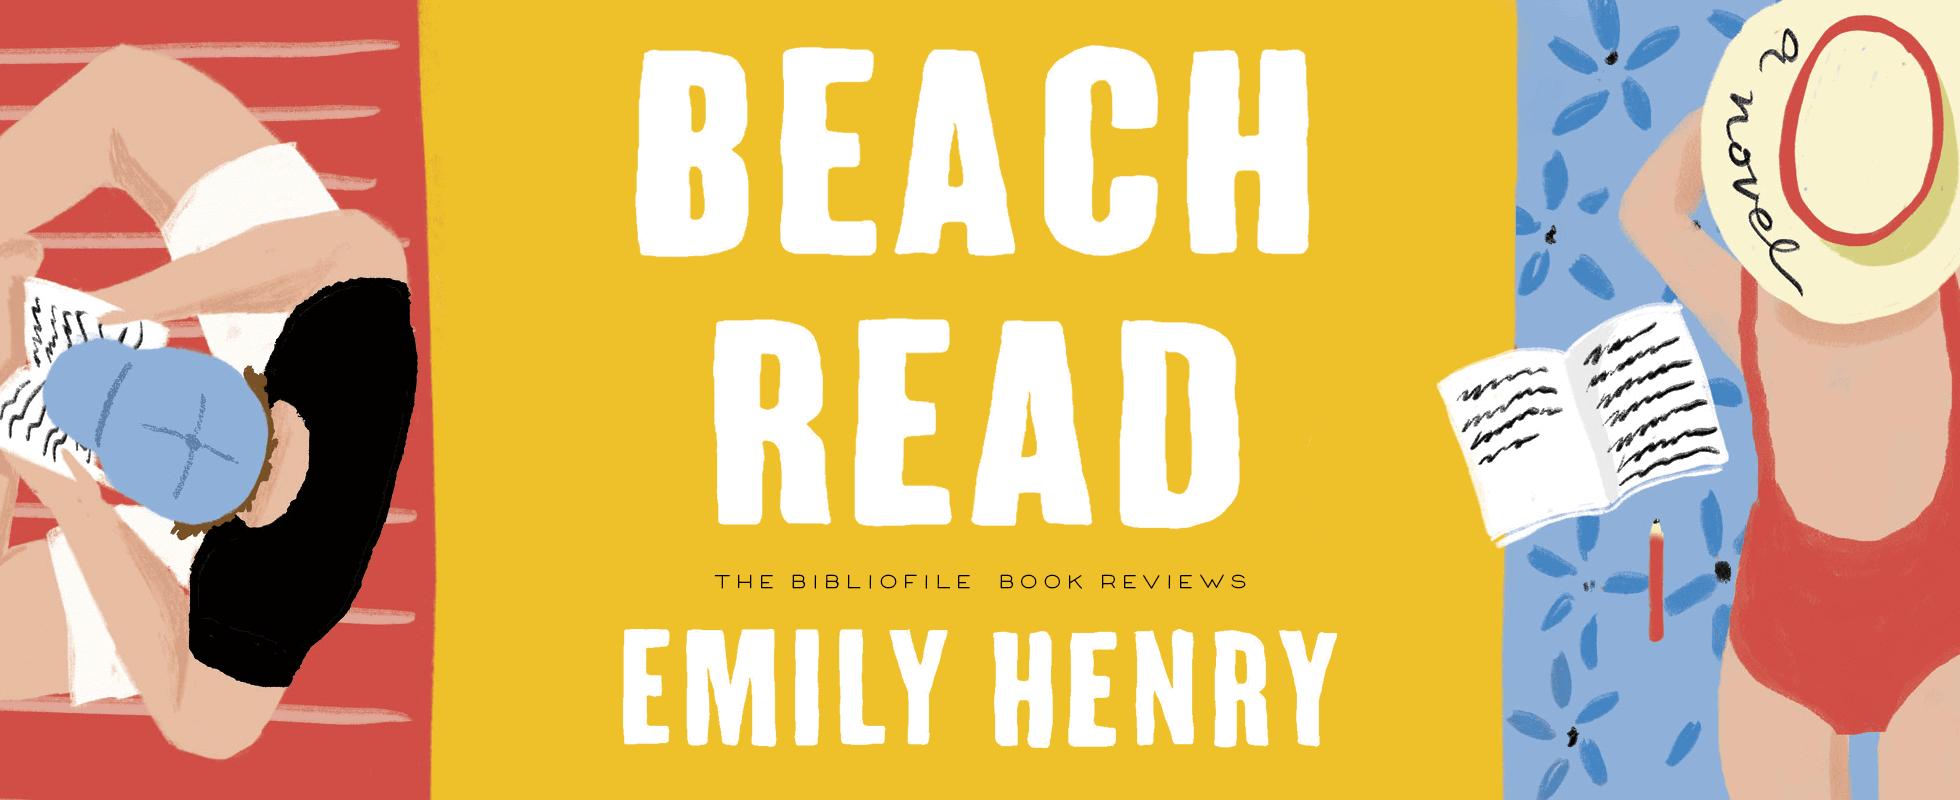 beach read by emily henry review summary plot book summary